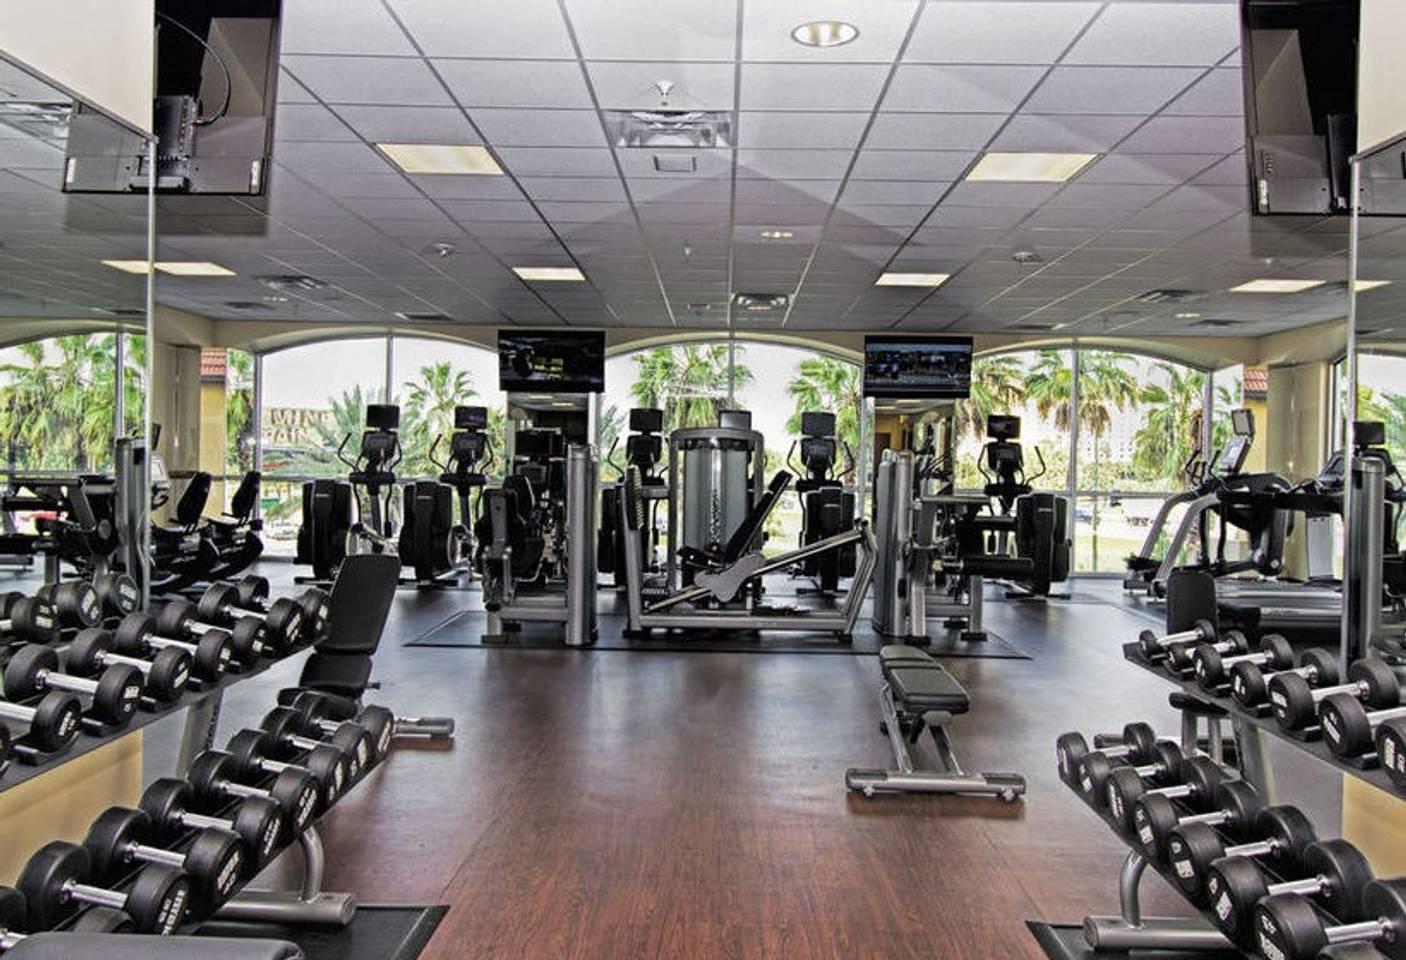 NEW - 2 Bedroom VIP in Orlando #Lakes photo 16529728